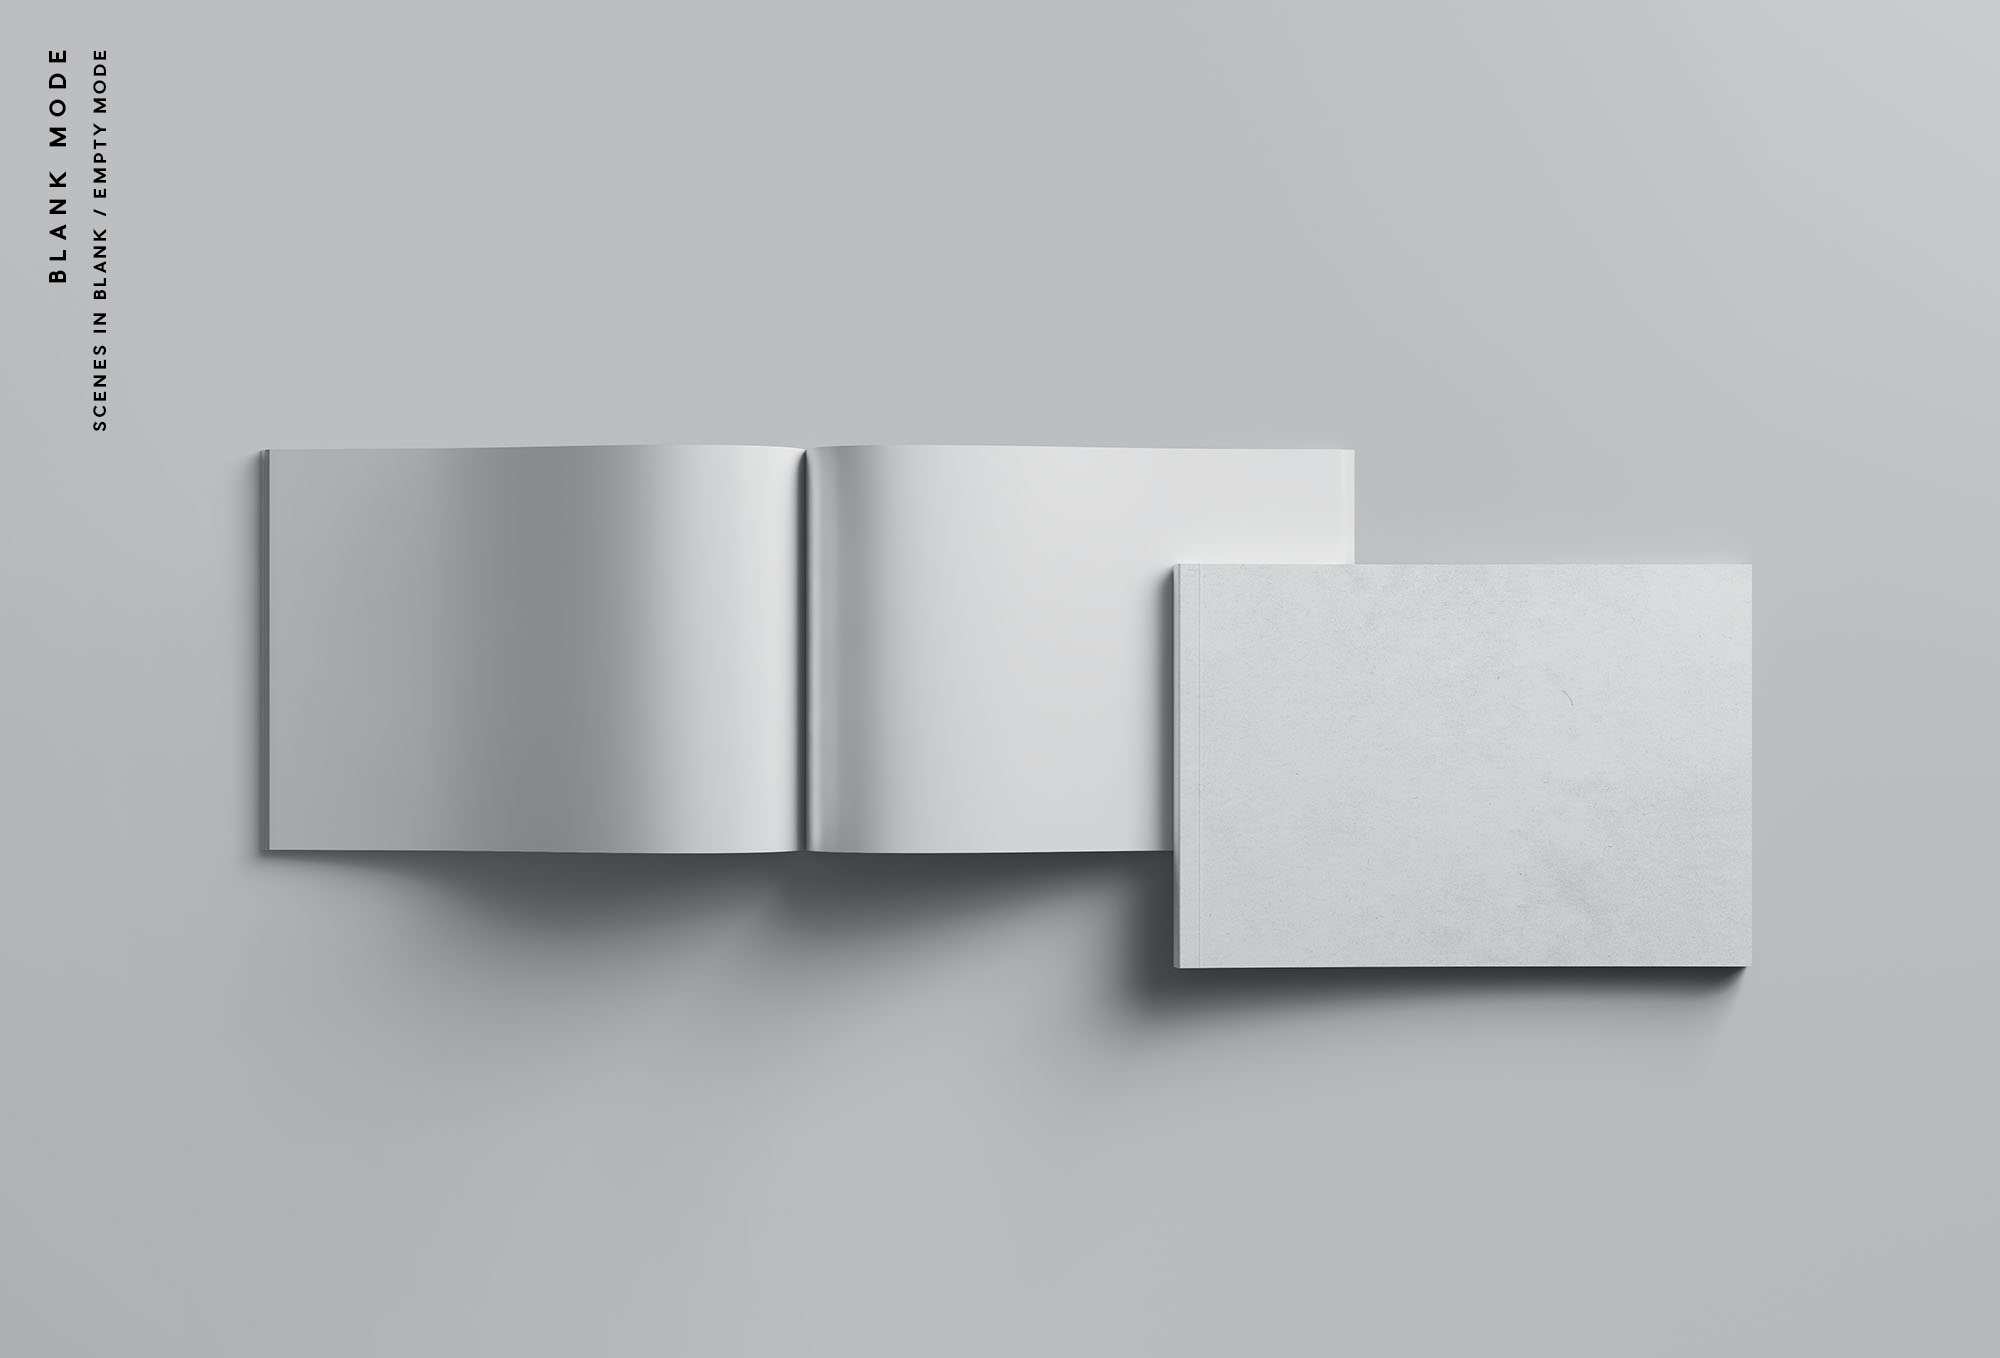 A4书籍画册杂志设计效果图样机模板 A4 Landscape Perfect Binding Brochure Mockup插图(8)